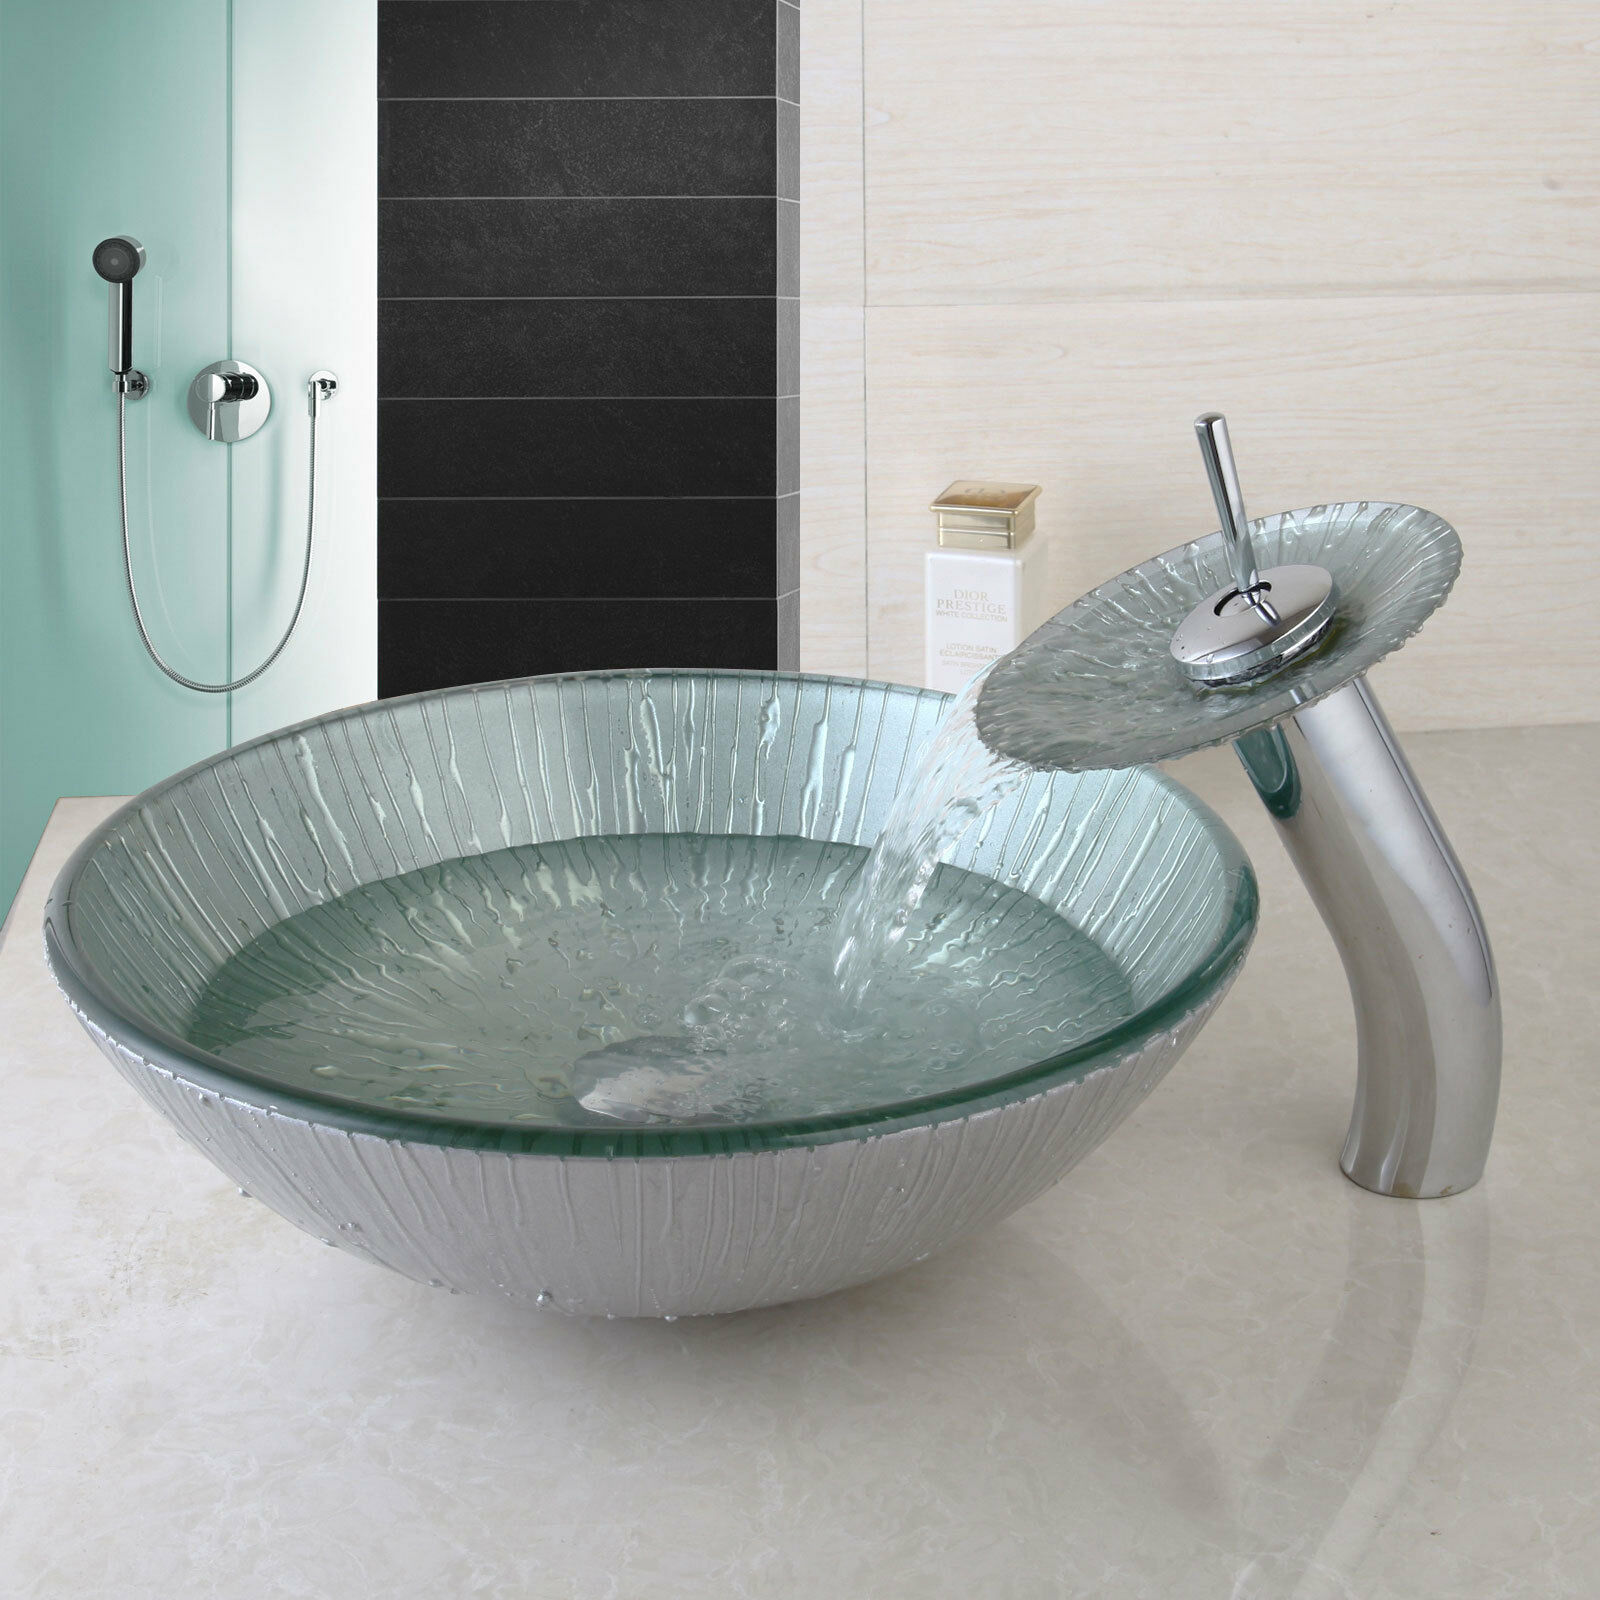 Type Bathroom Temperouge Glass Faucet Sink Basin TAP Washing Bowl Mixeur Waterfall